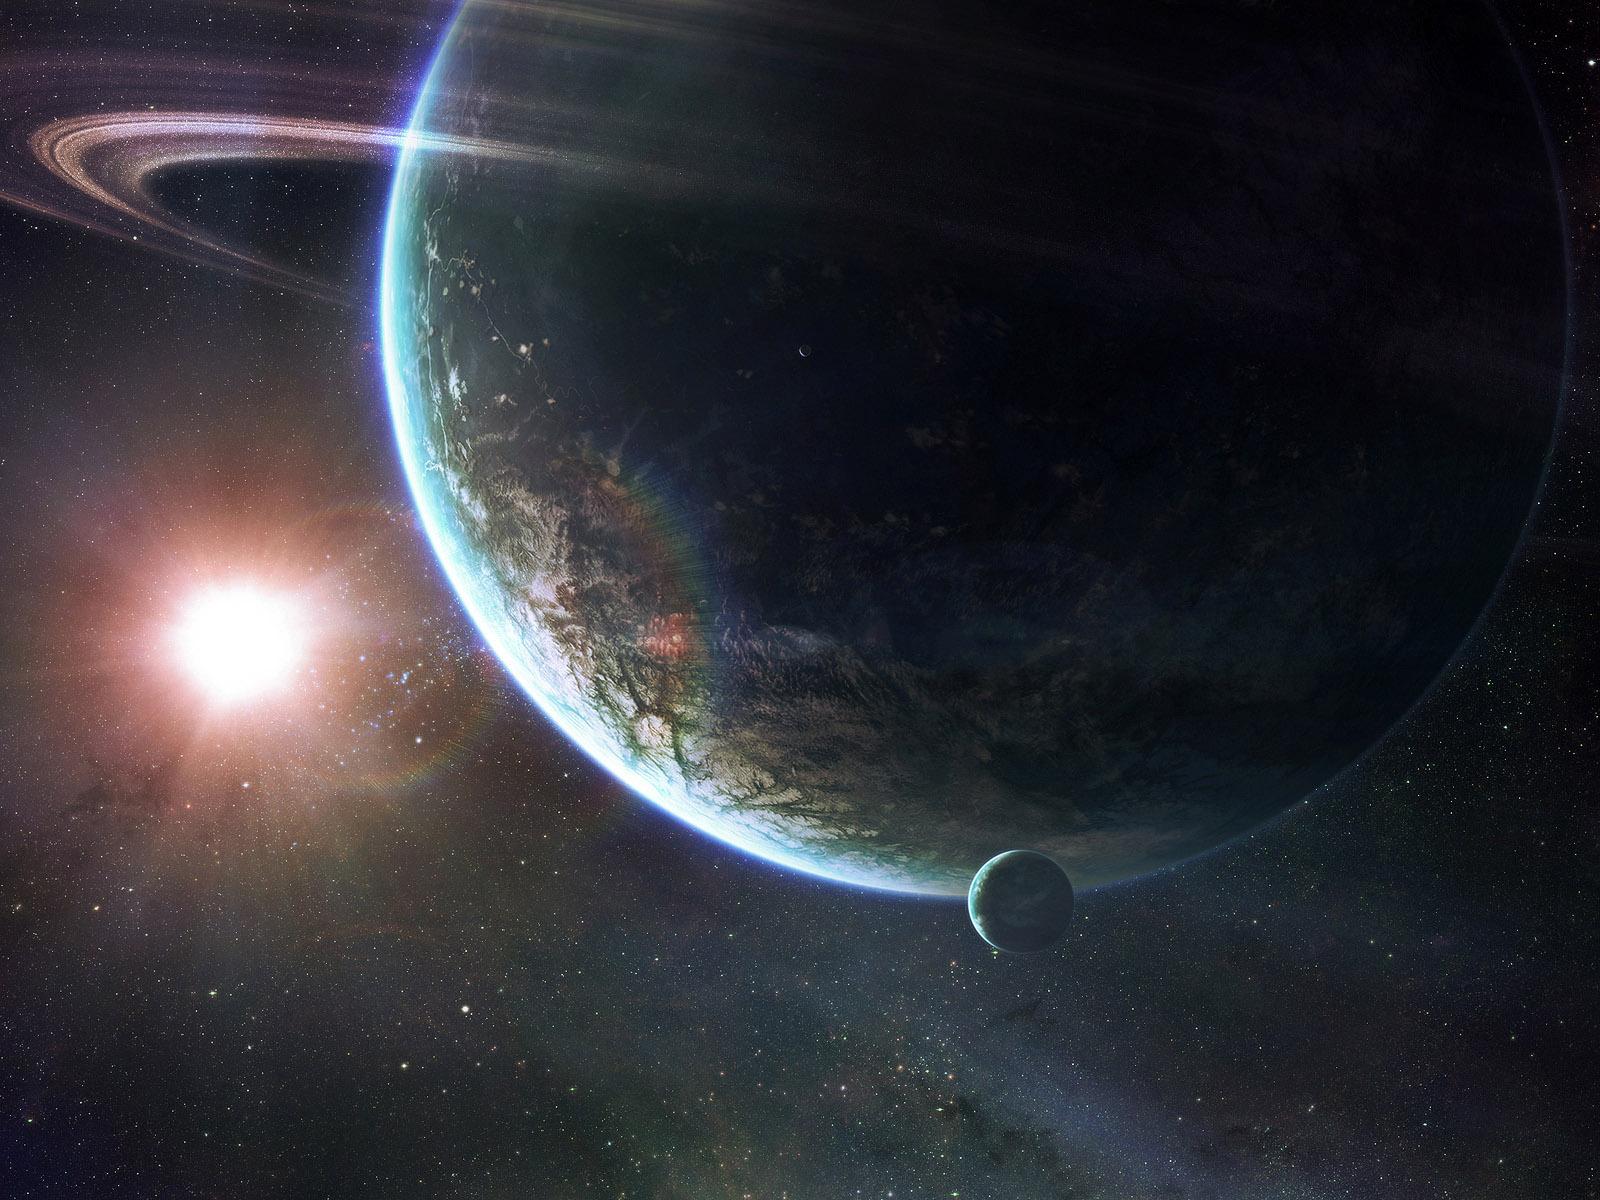 http://3.bp.blogspot.com/-XhYOQVLsW-s/Tnoec1nQJgI/AAAAAAAAARs/KOn5gpyy2FI/s1600/planet_in_universe-normal.jpg